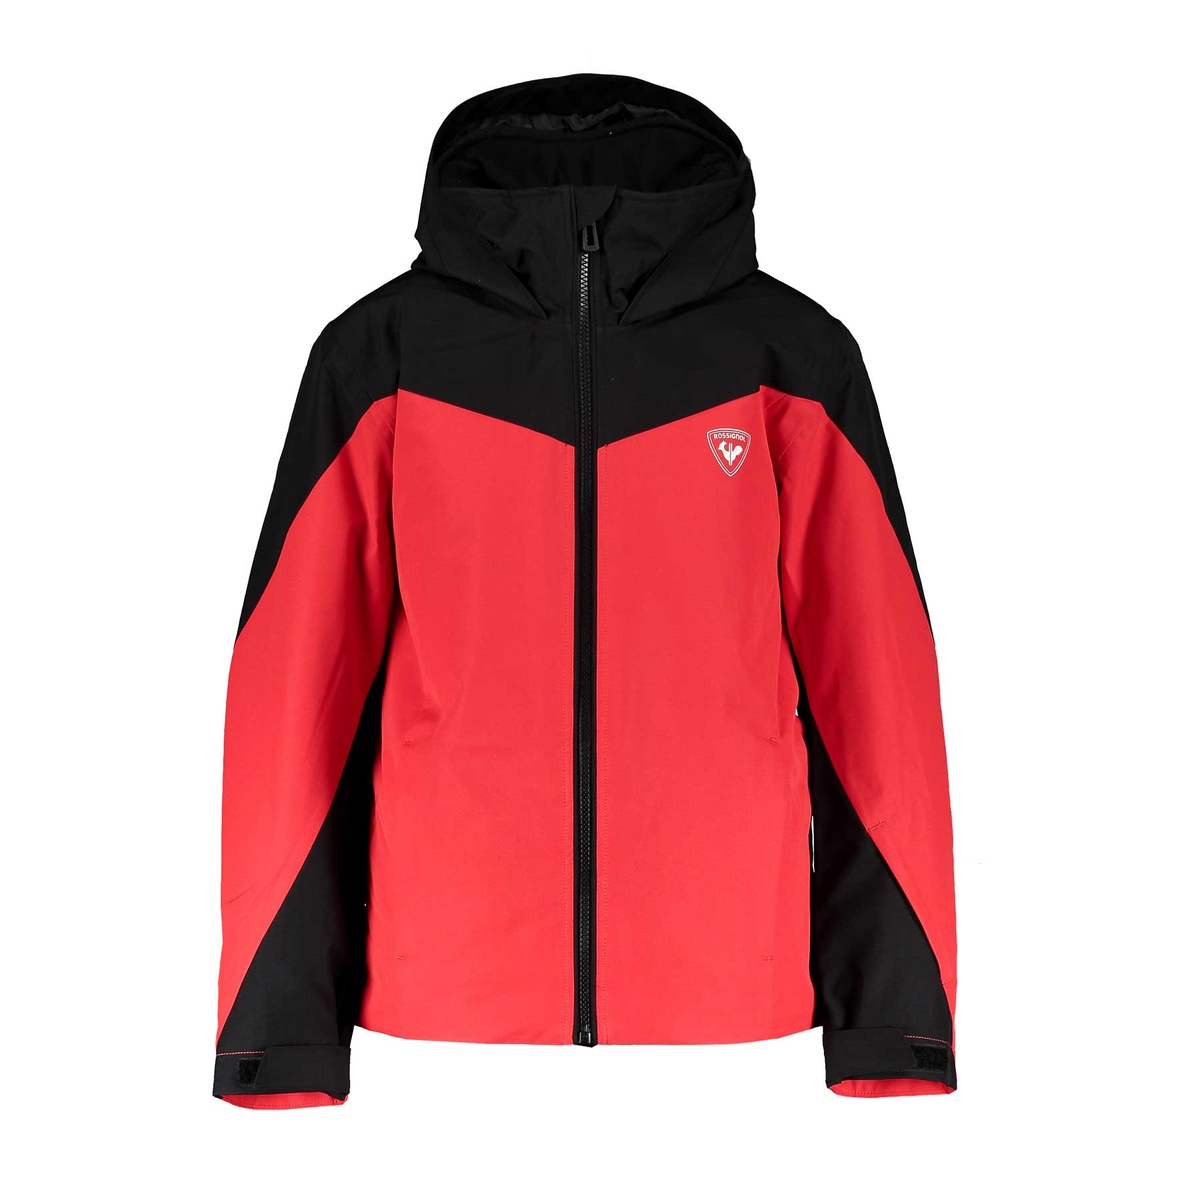 Prezzi Rossignol completo giacca fonction +pantaloni ski bambino